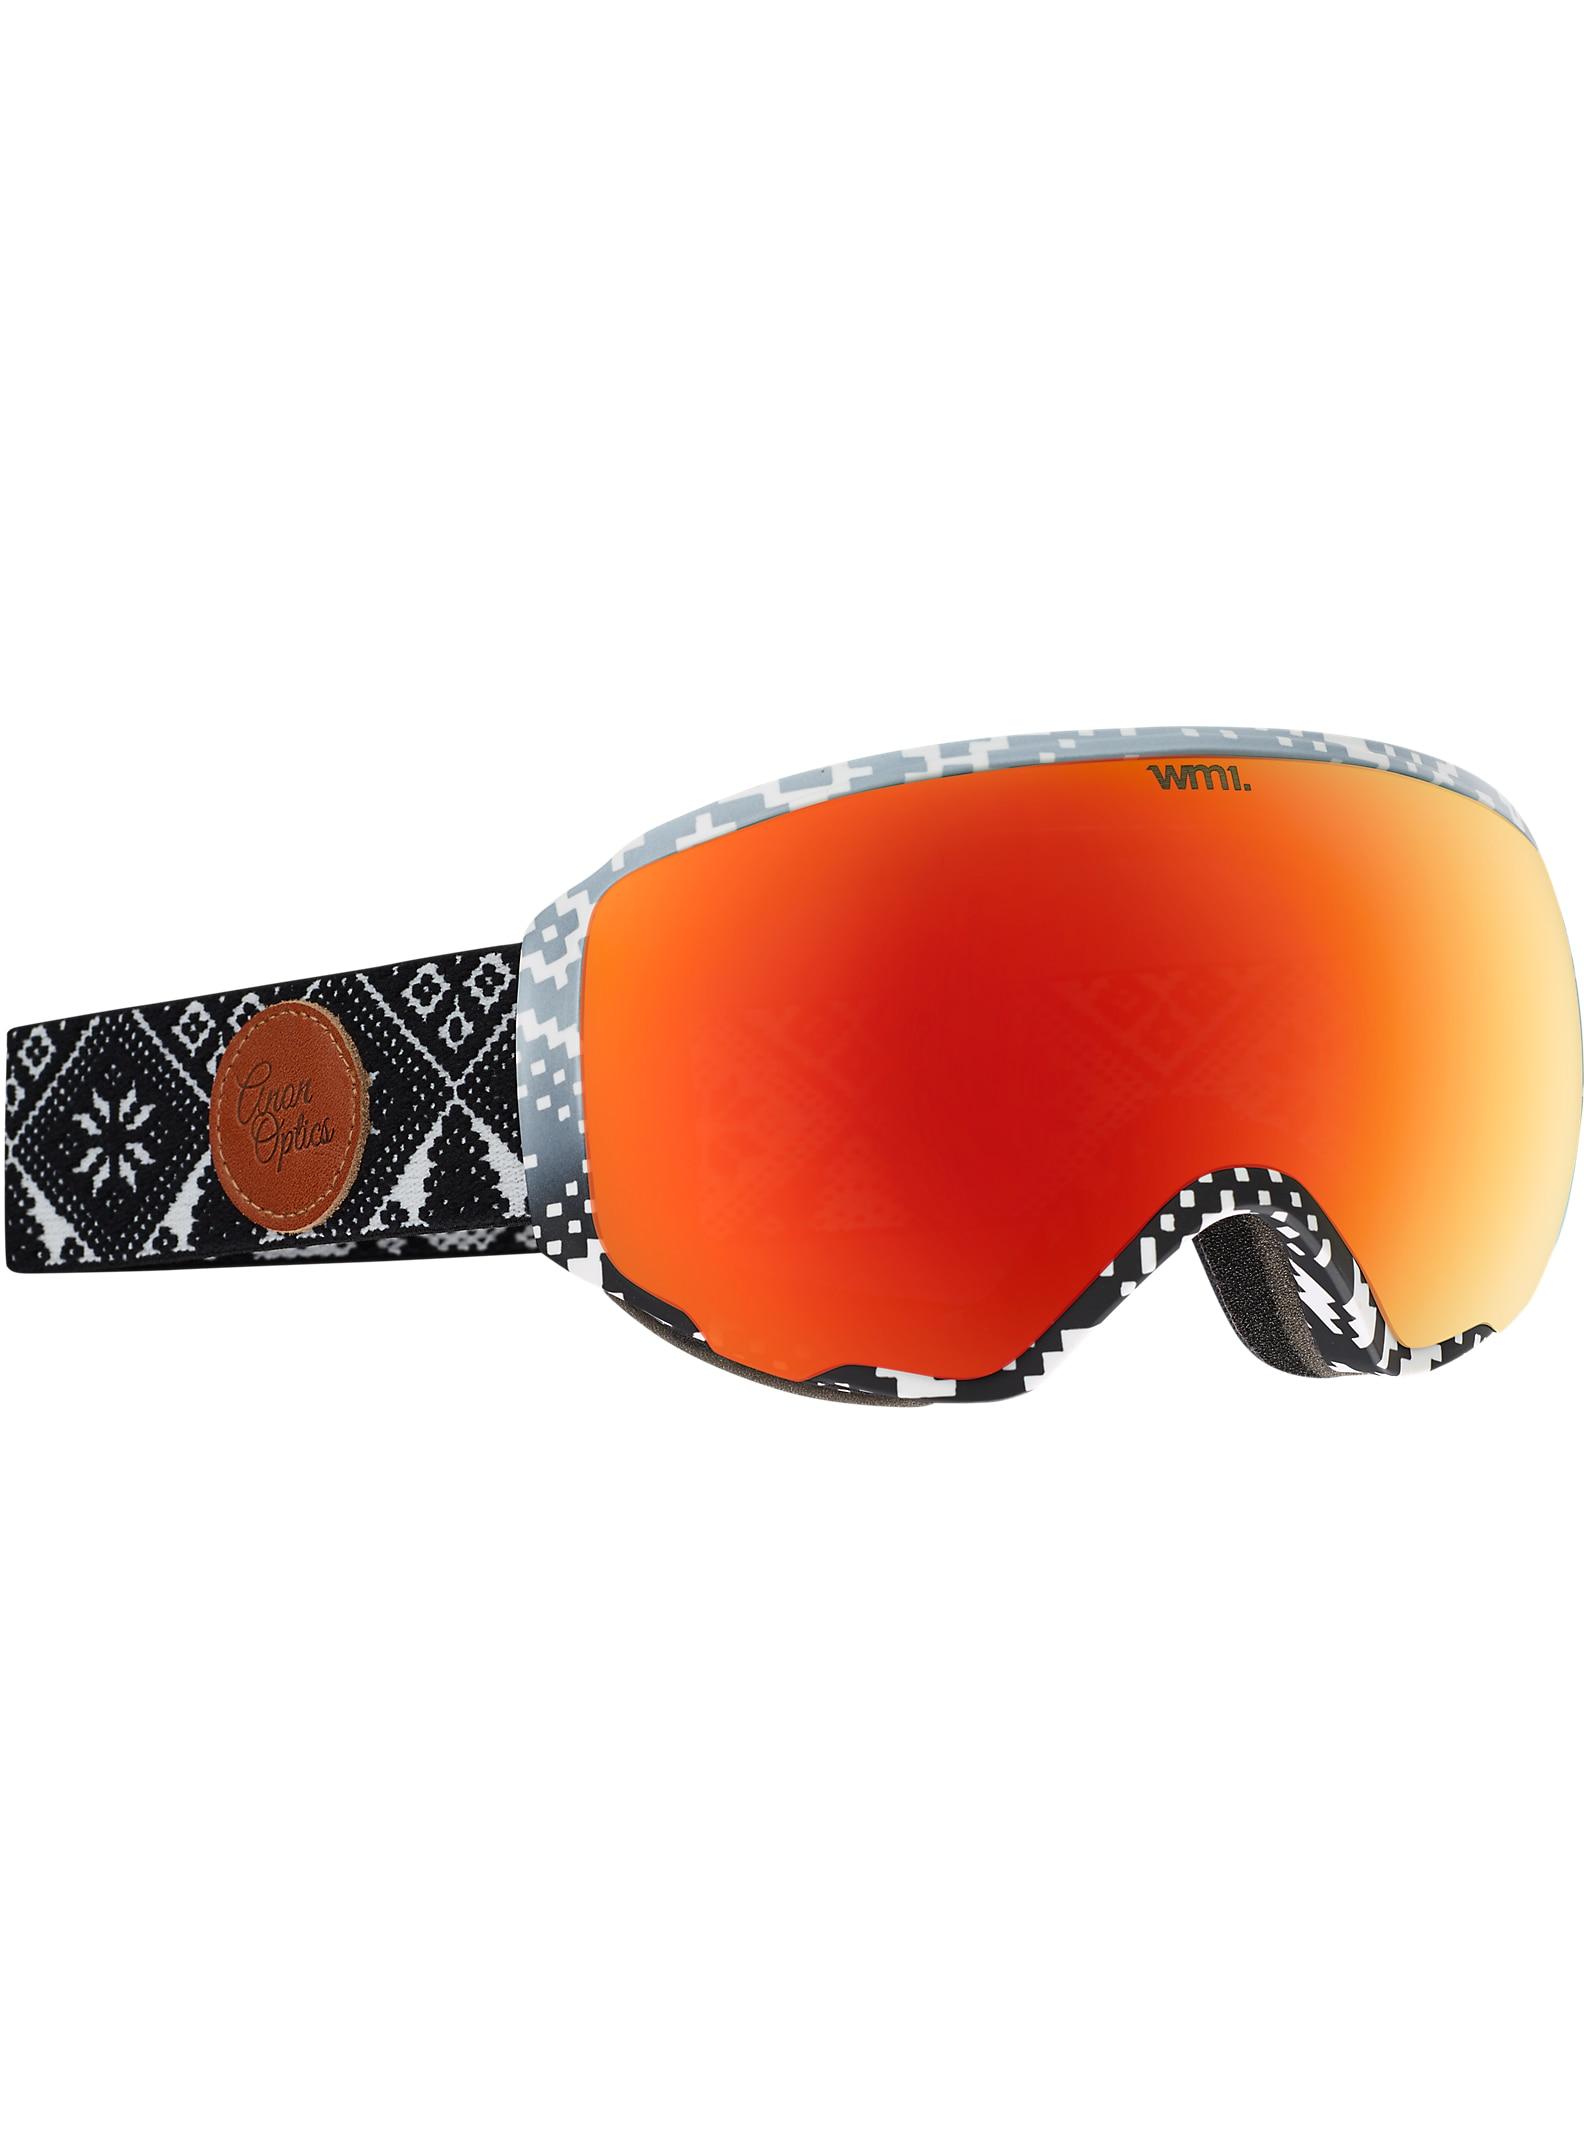 anon. WM1 Goggle angezeigt in Rahmen: Apres, Brillenglas: Red Solex